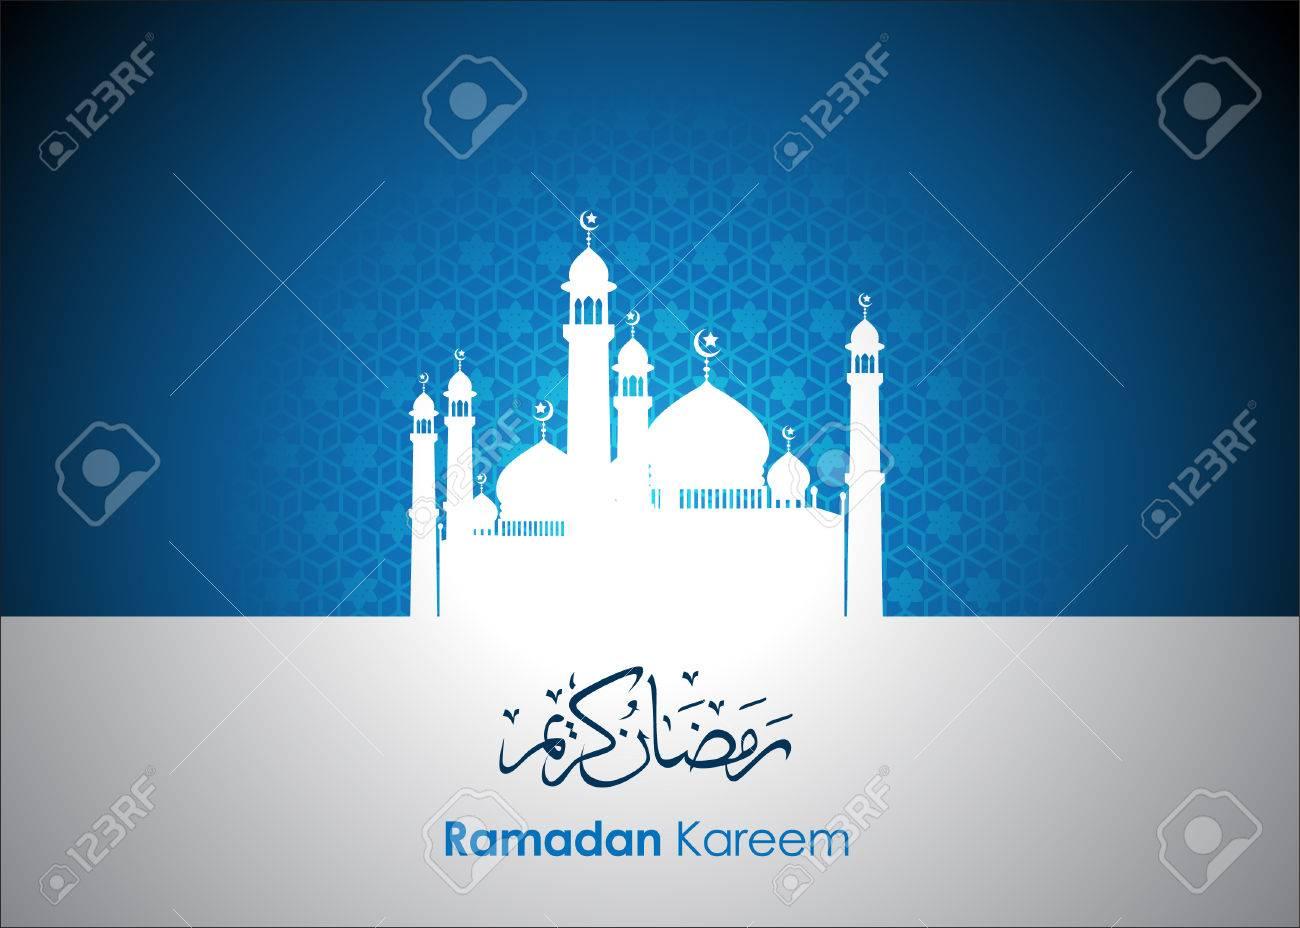 Ramadan greetings in arabic script an islamic greeting card ramadan greetings in arabic script an islamic greeting card for holy month of ramadan kareem kristyandbryce Images